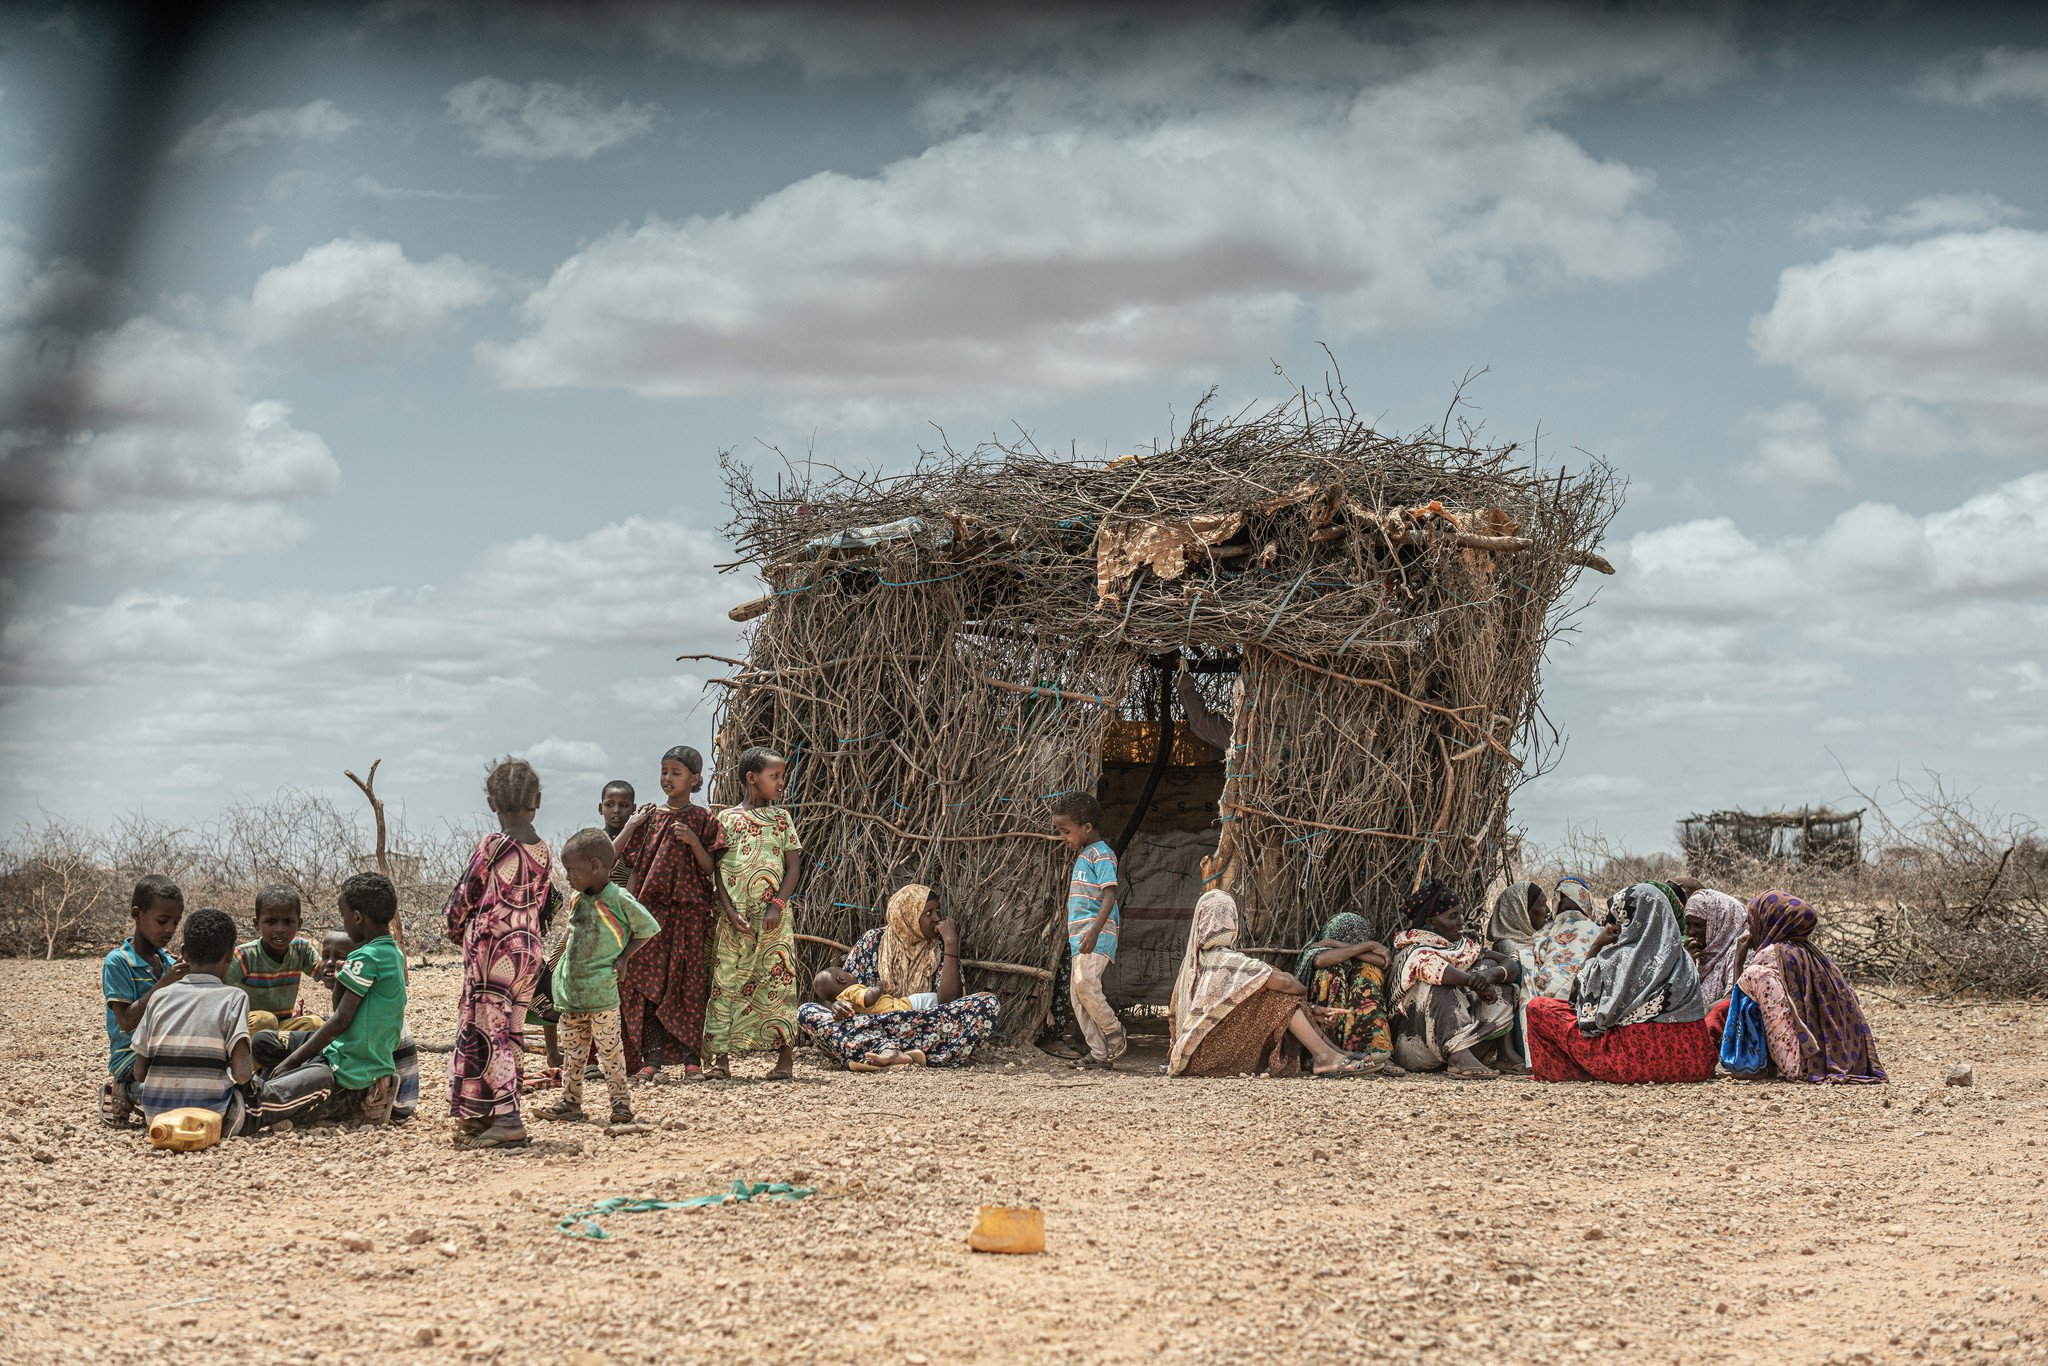 Children in front of a straw hut